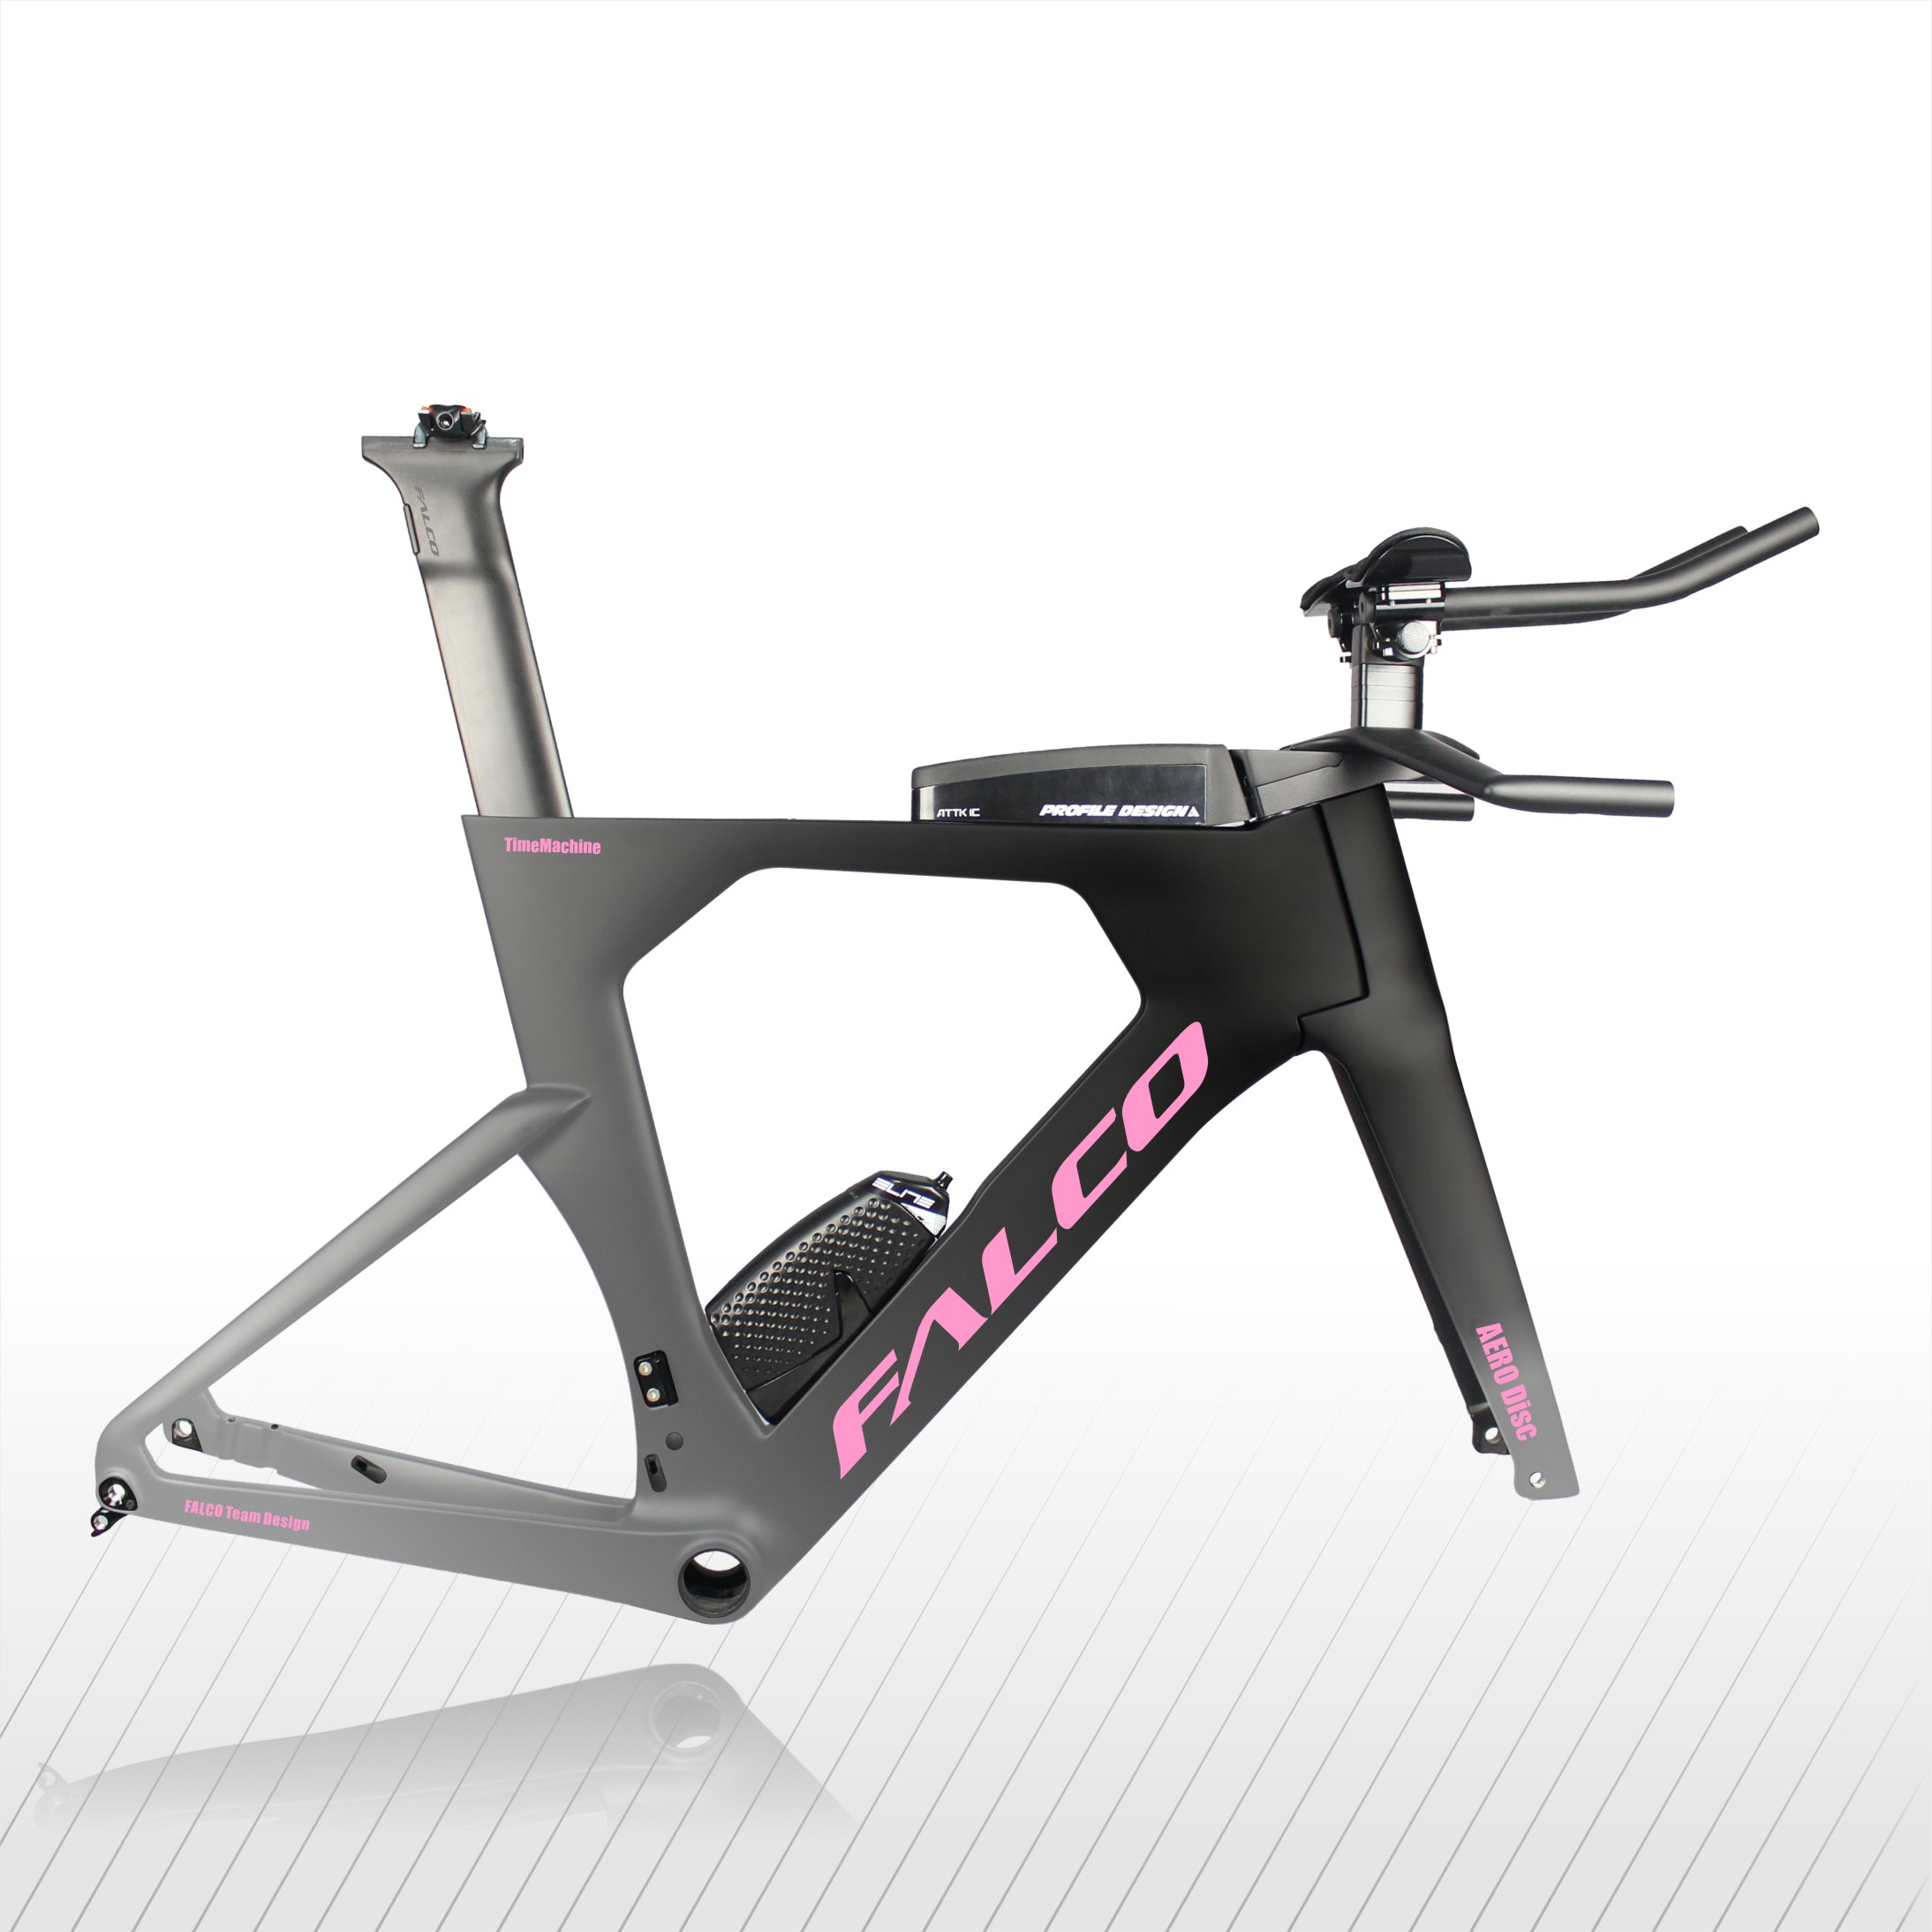 FALCO Aero triathlon bikes DI 2 Carbon Fiber TT01 48/52/54/56/58cm Chinese Carbon tt frame 700c time trial frame TT912